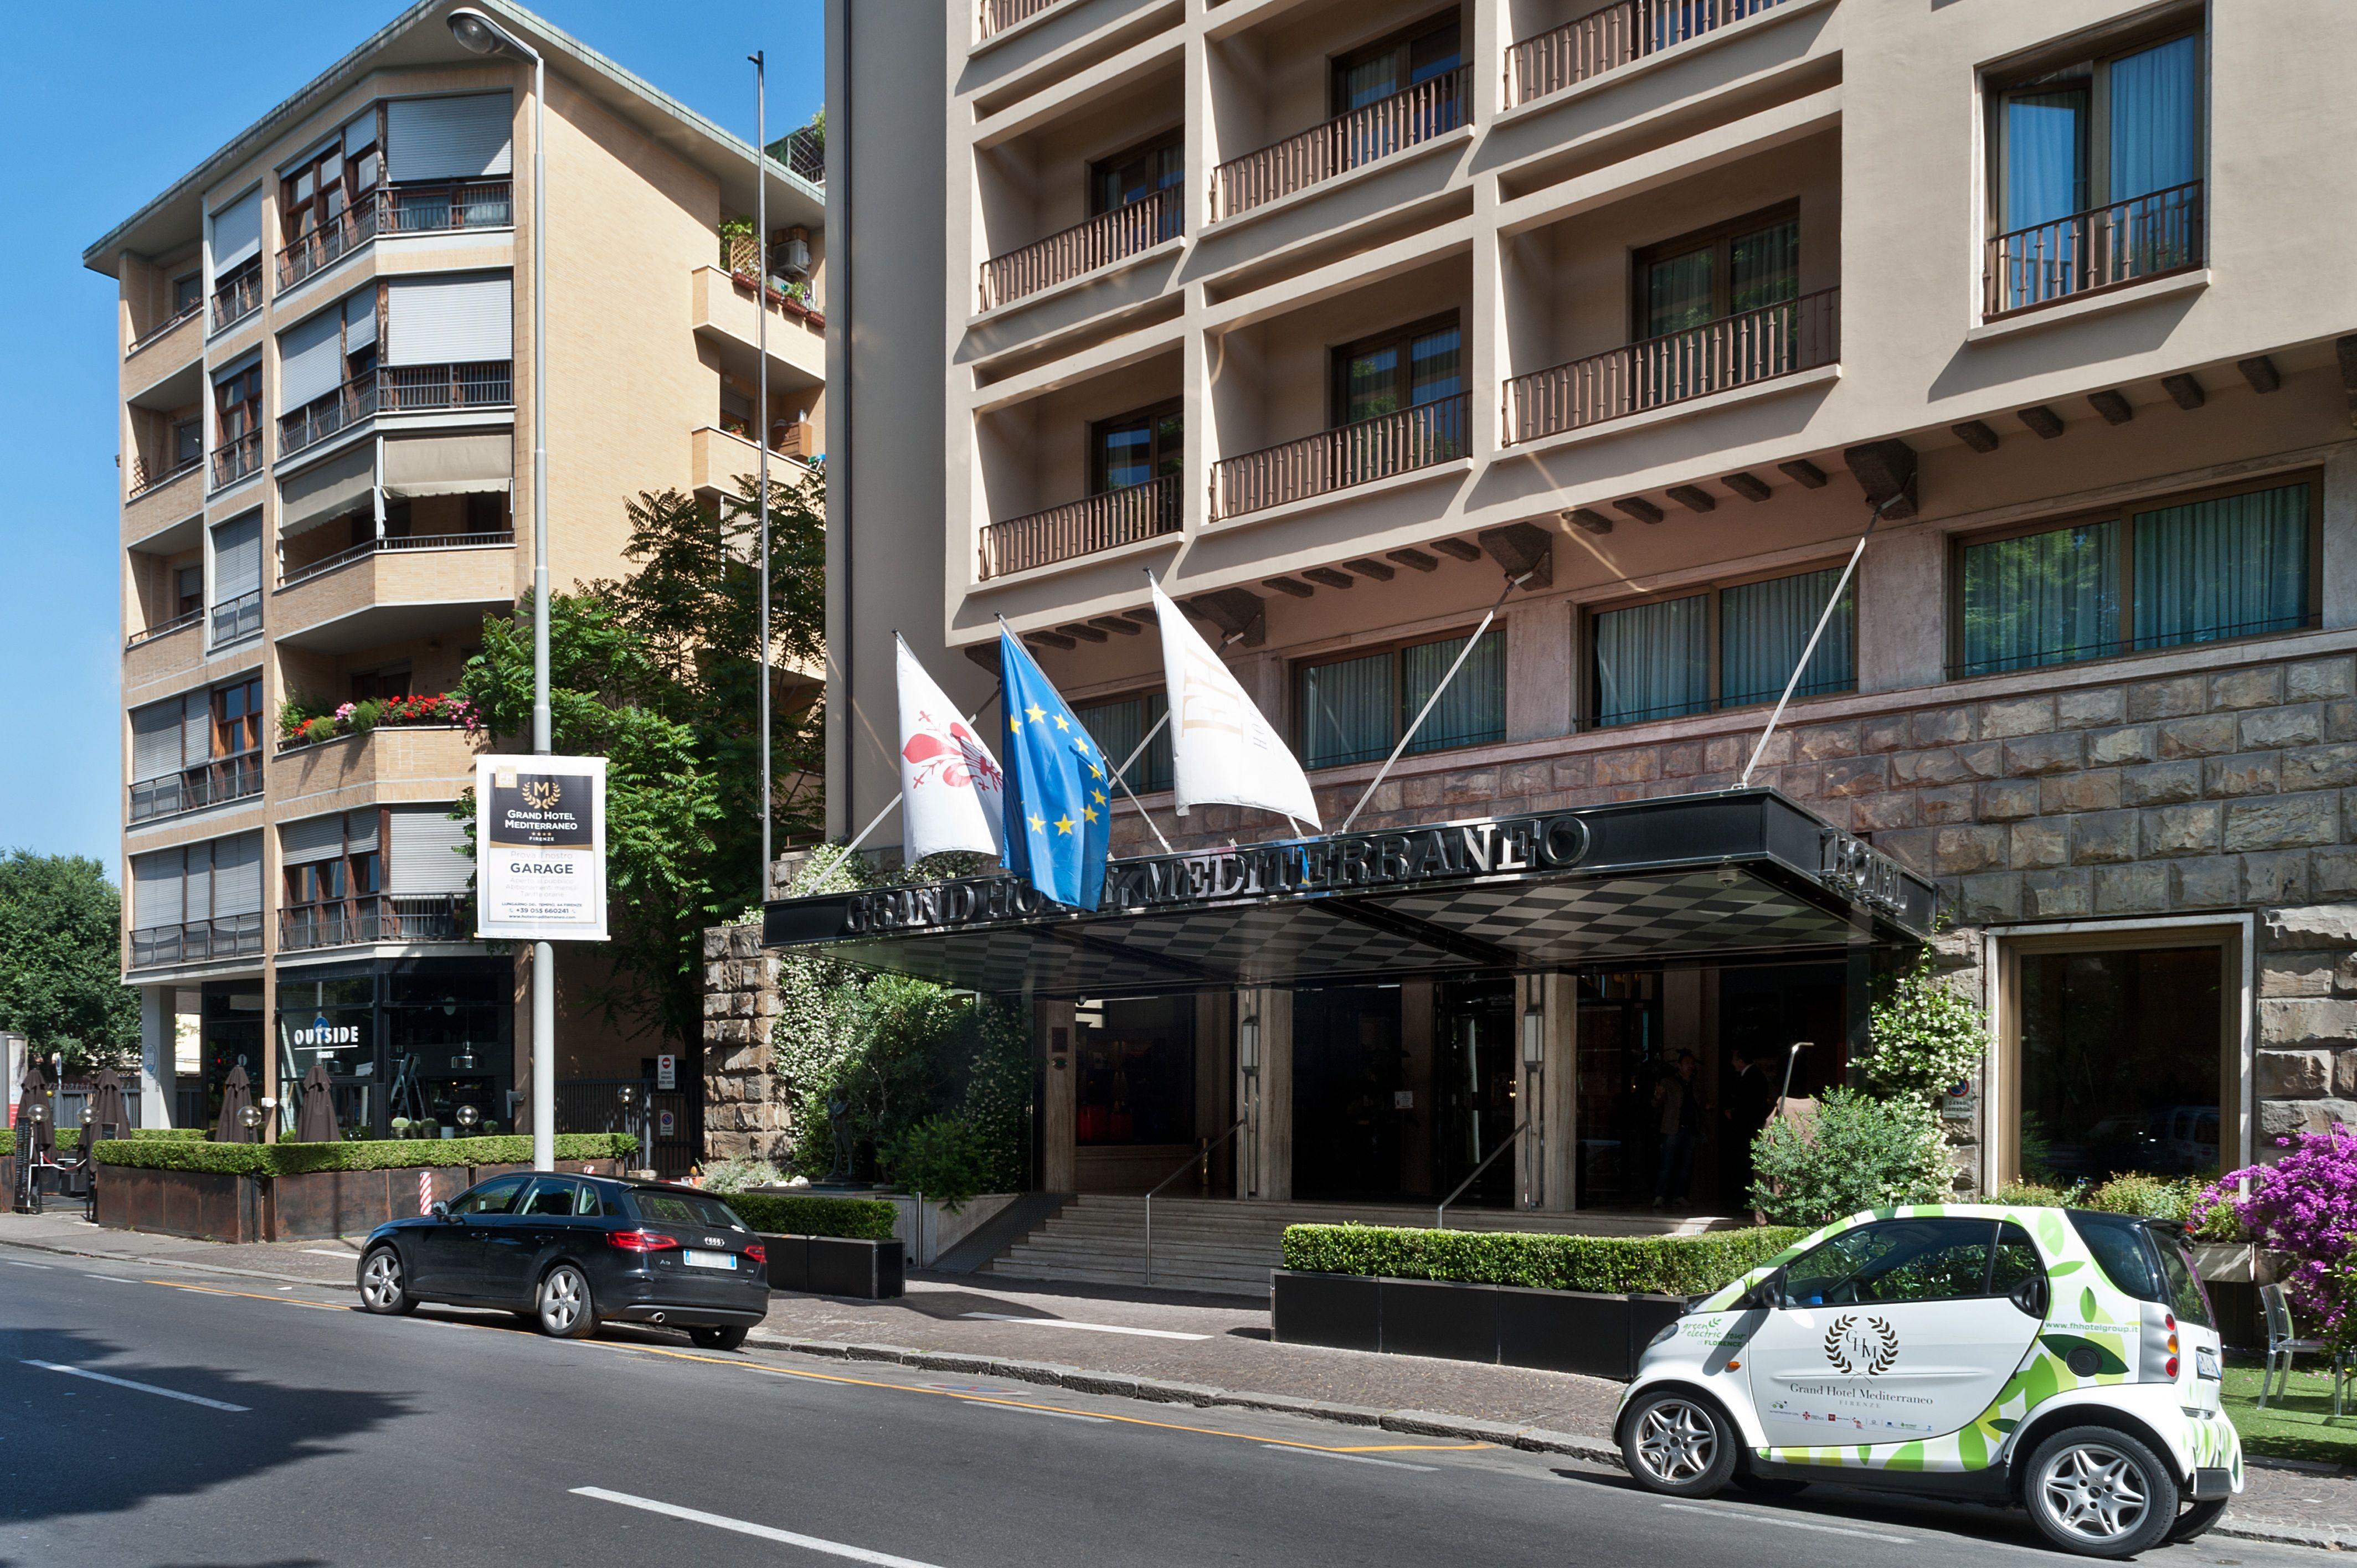 The Grand Hotel Mediterraneo is located near the Arno ...